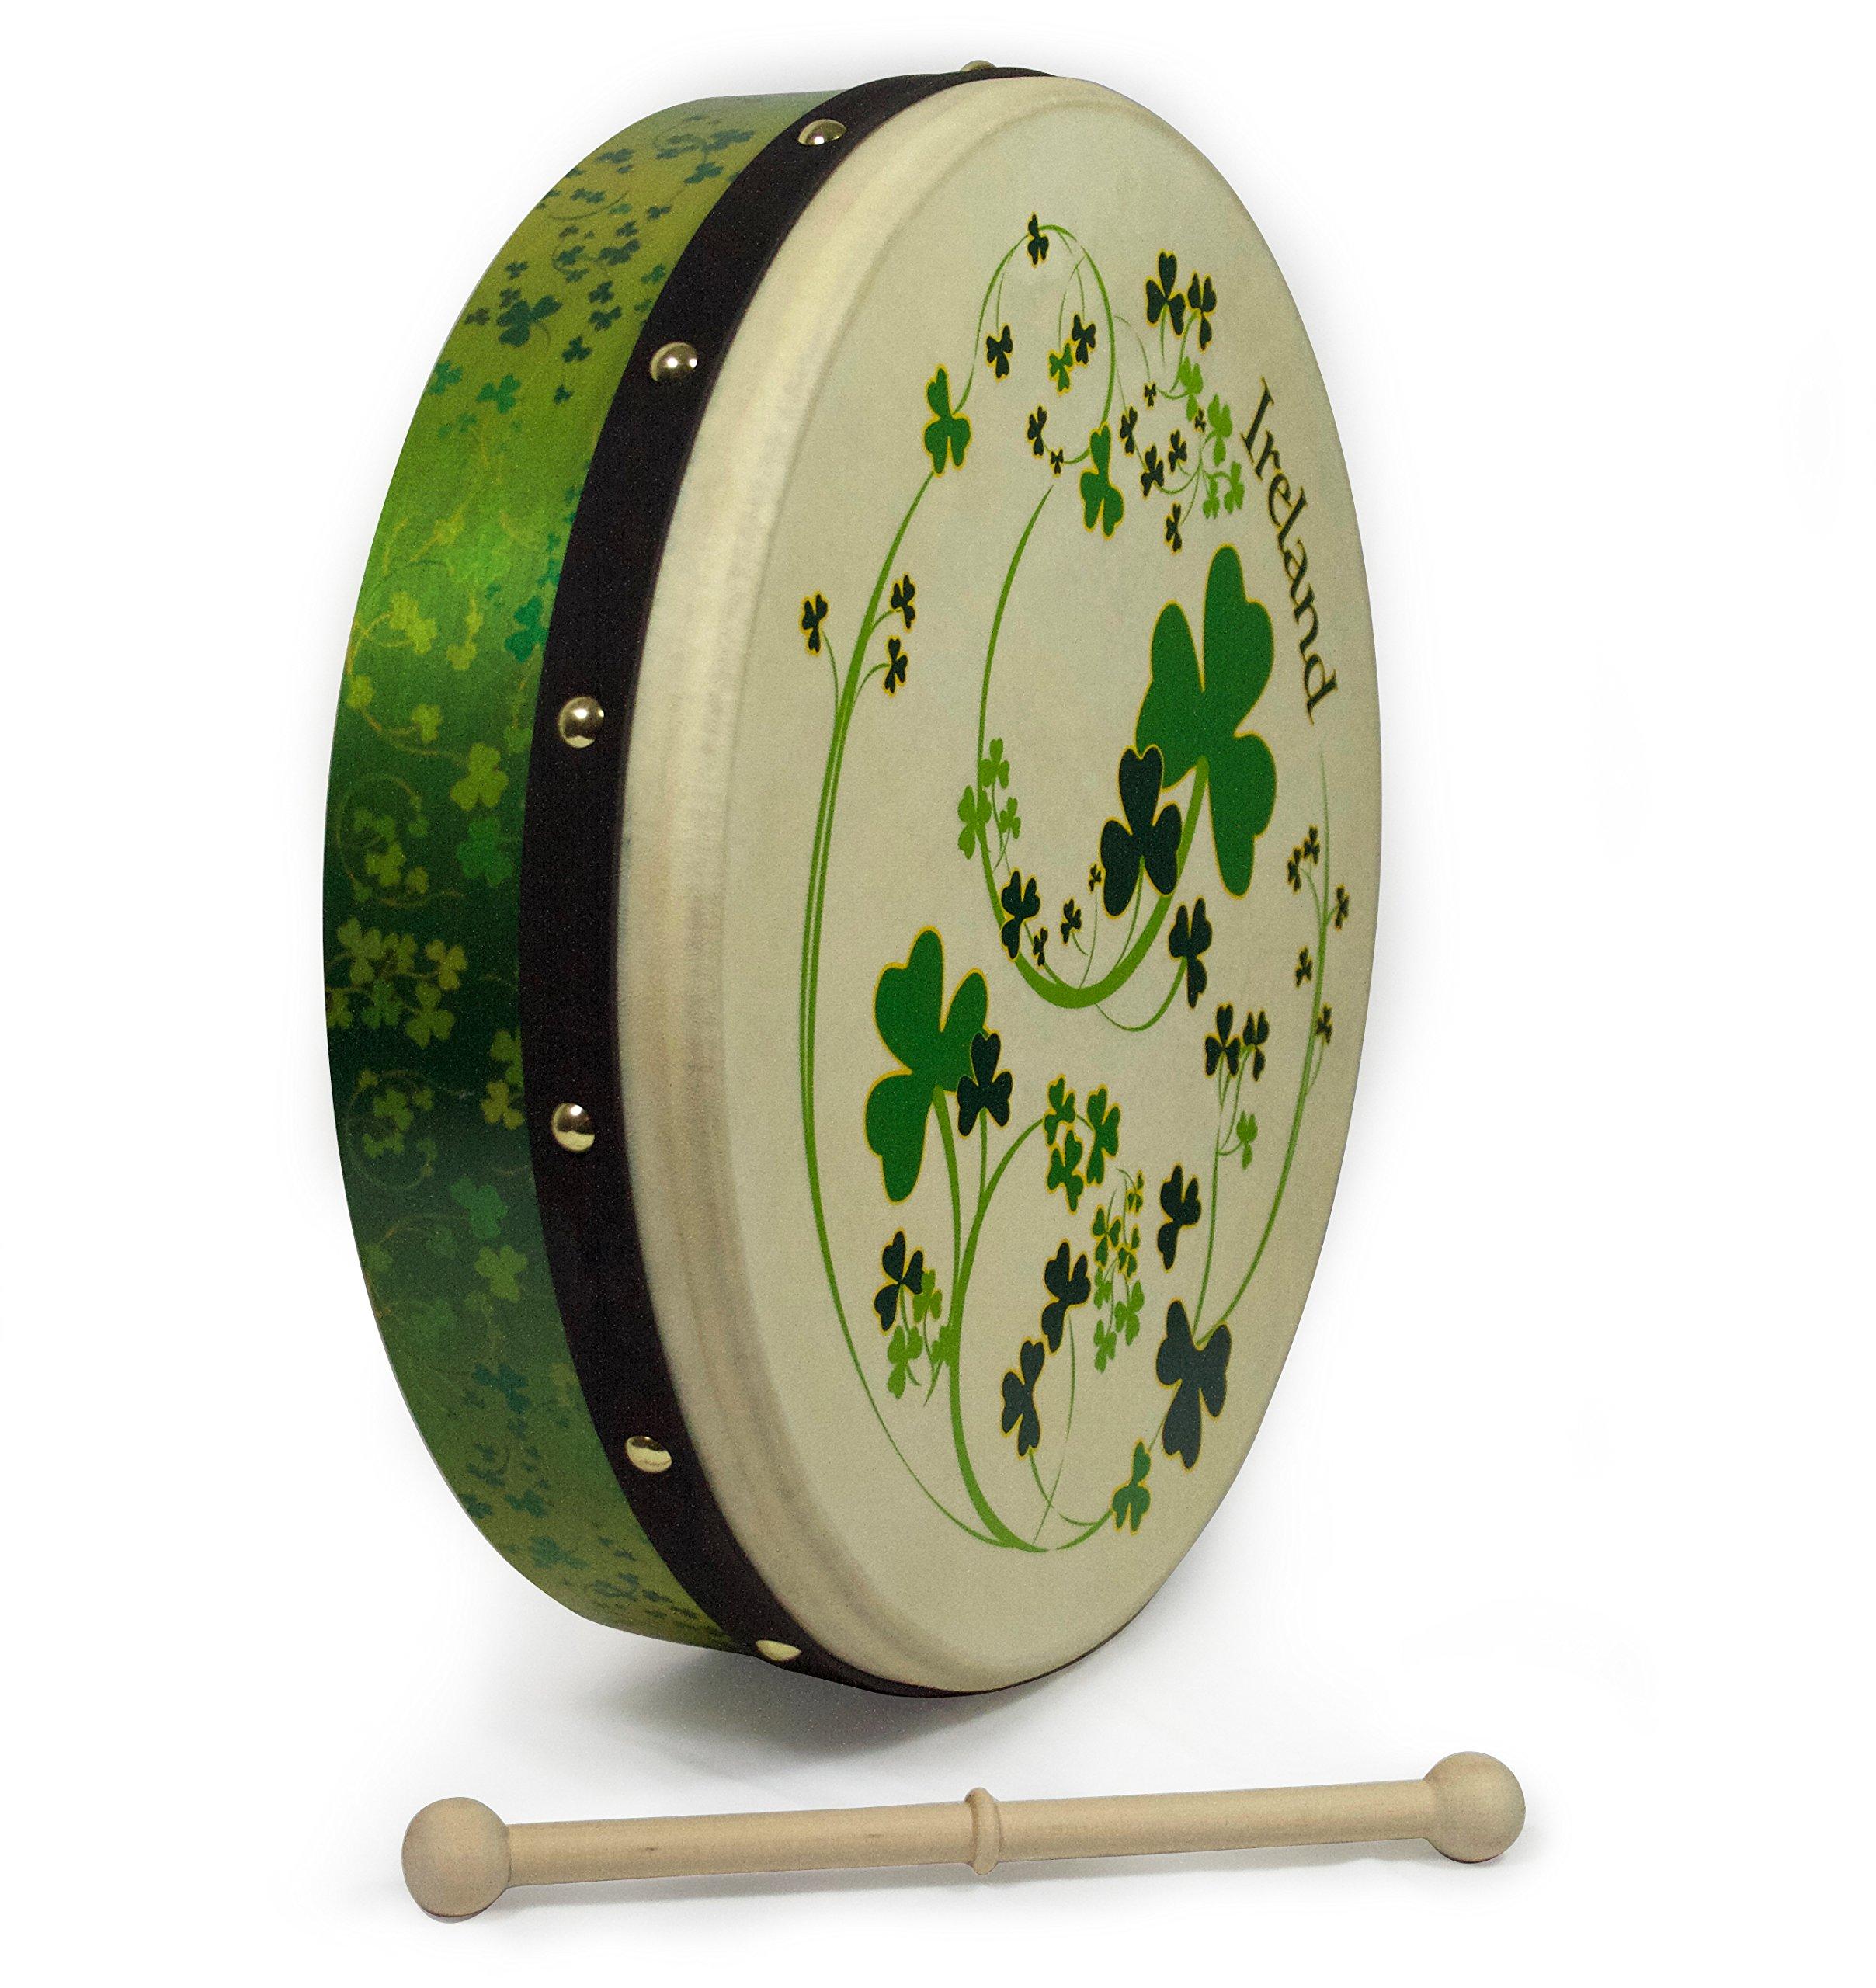 Waltons 15 Inch All Shamrocks Bodhrán - Handcrafted Irish Instrument - Crisp & Musical Tone - Hardwood Beater Included w/Purchase